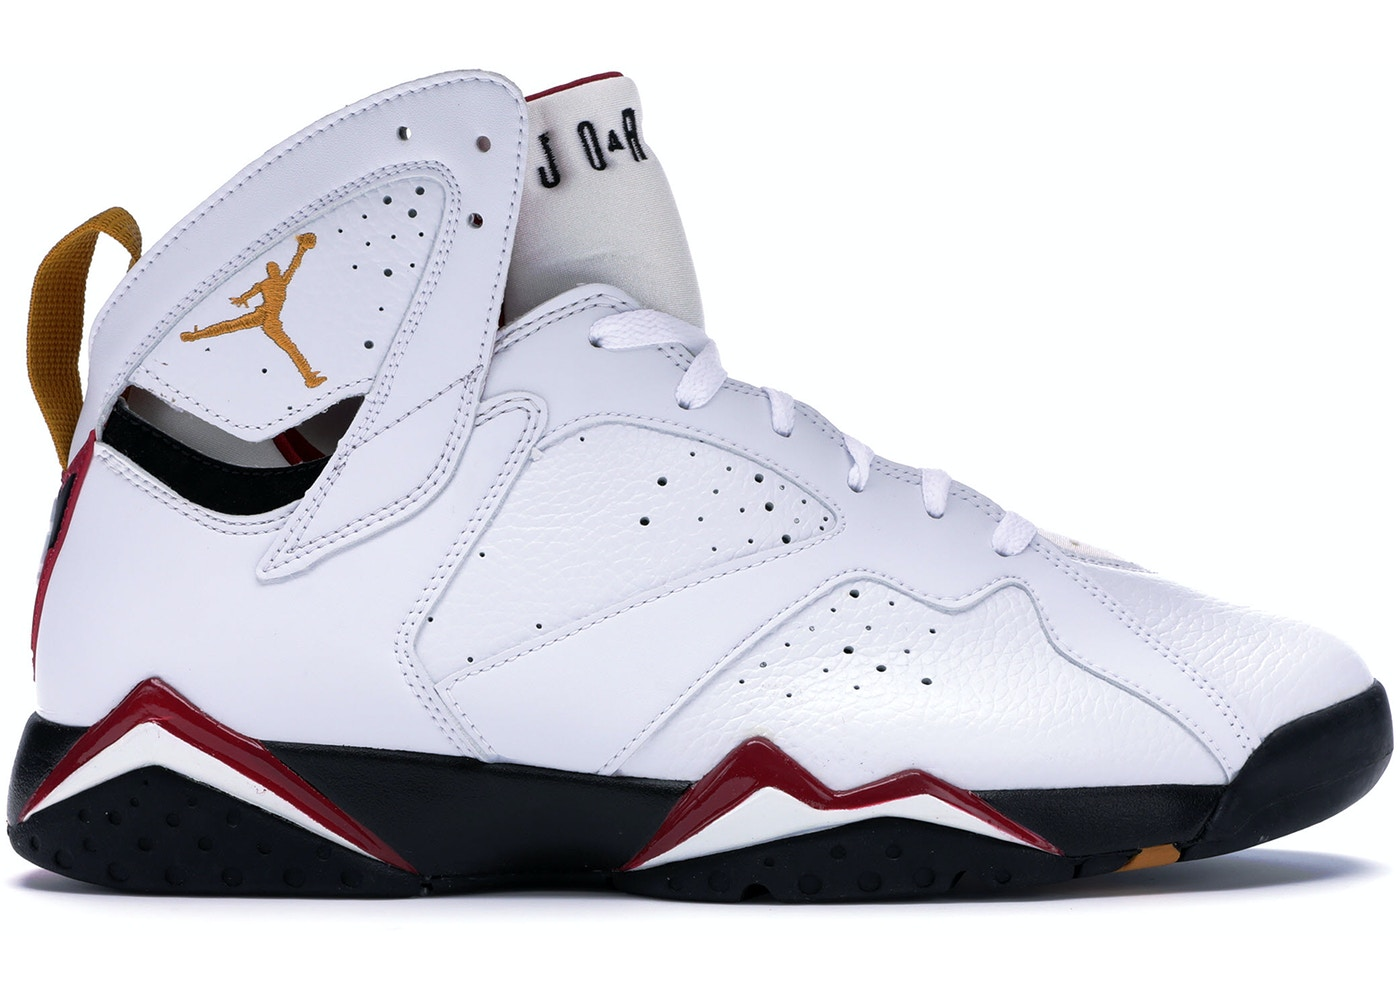 outlet store 697a2 2173c Air Jordan 7 Size 13 Shoes - New Highest Bids